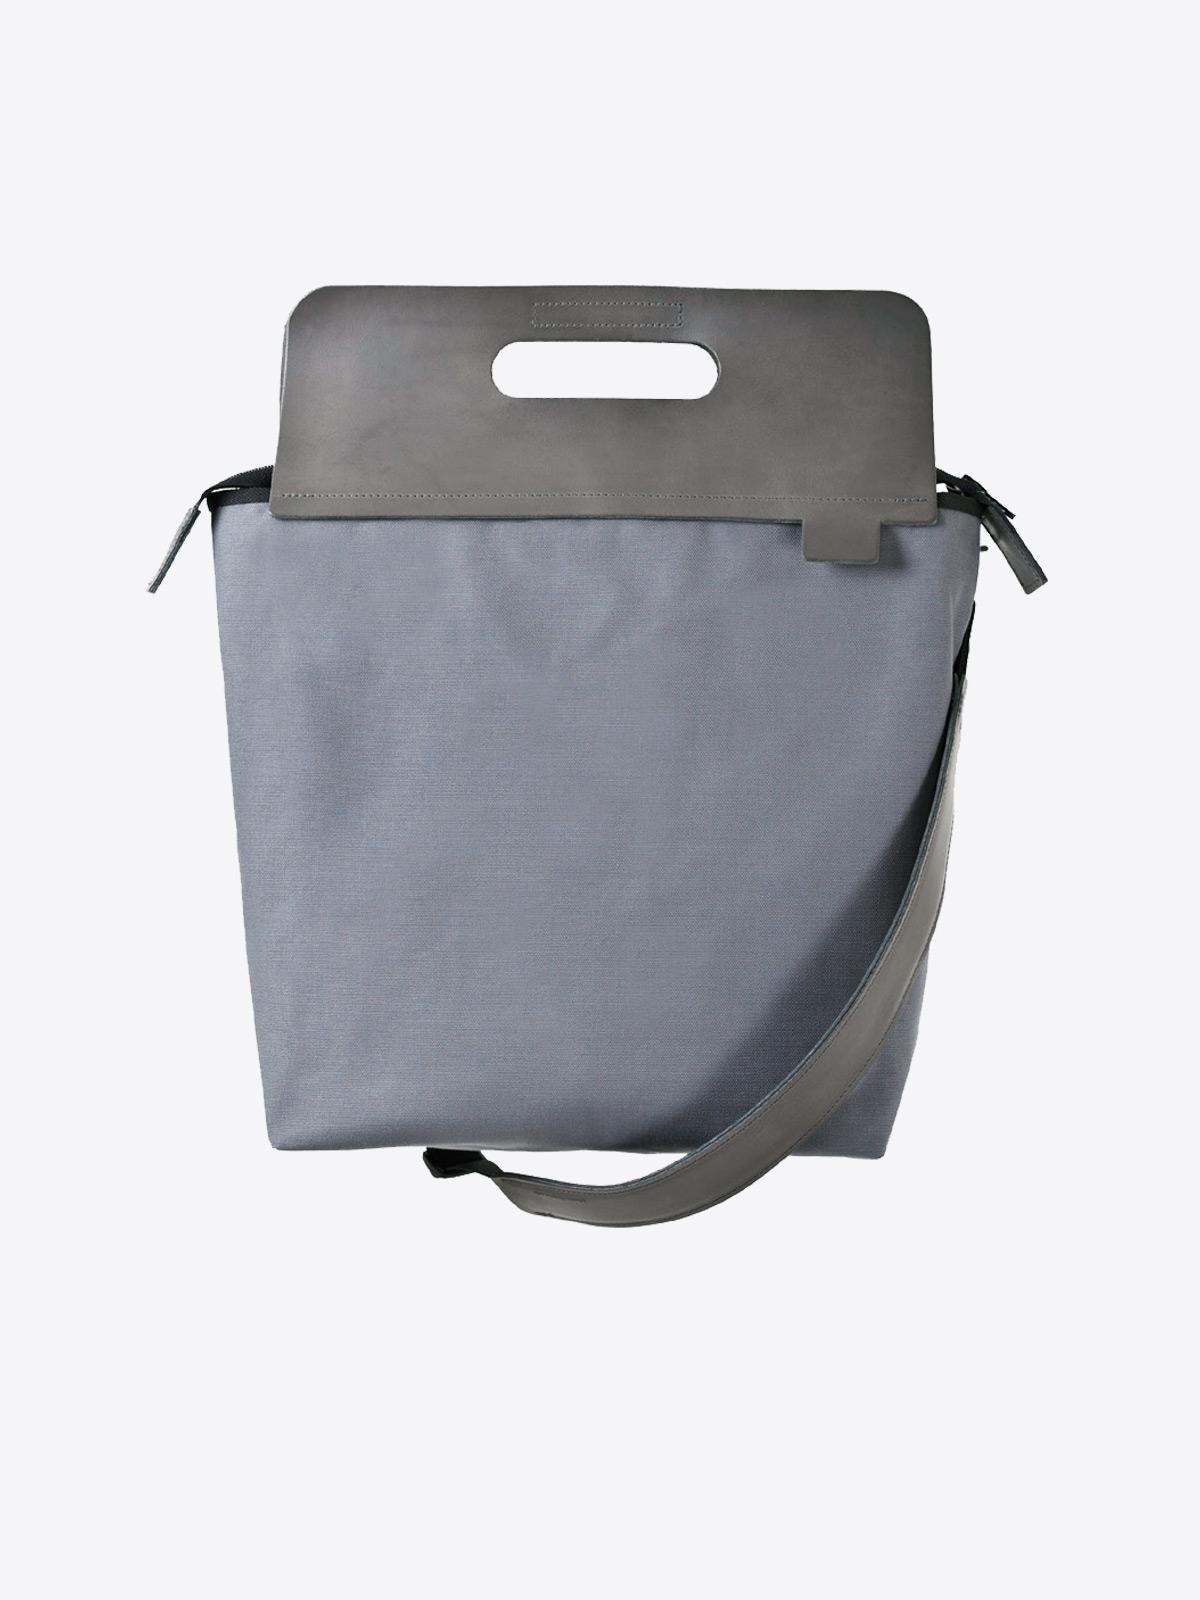 A2 grey